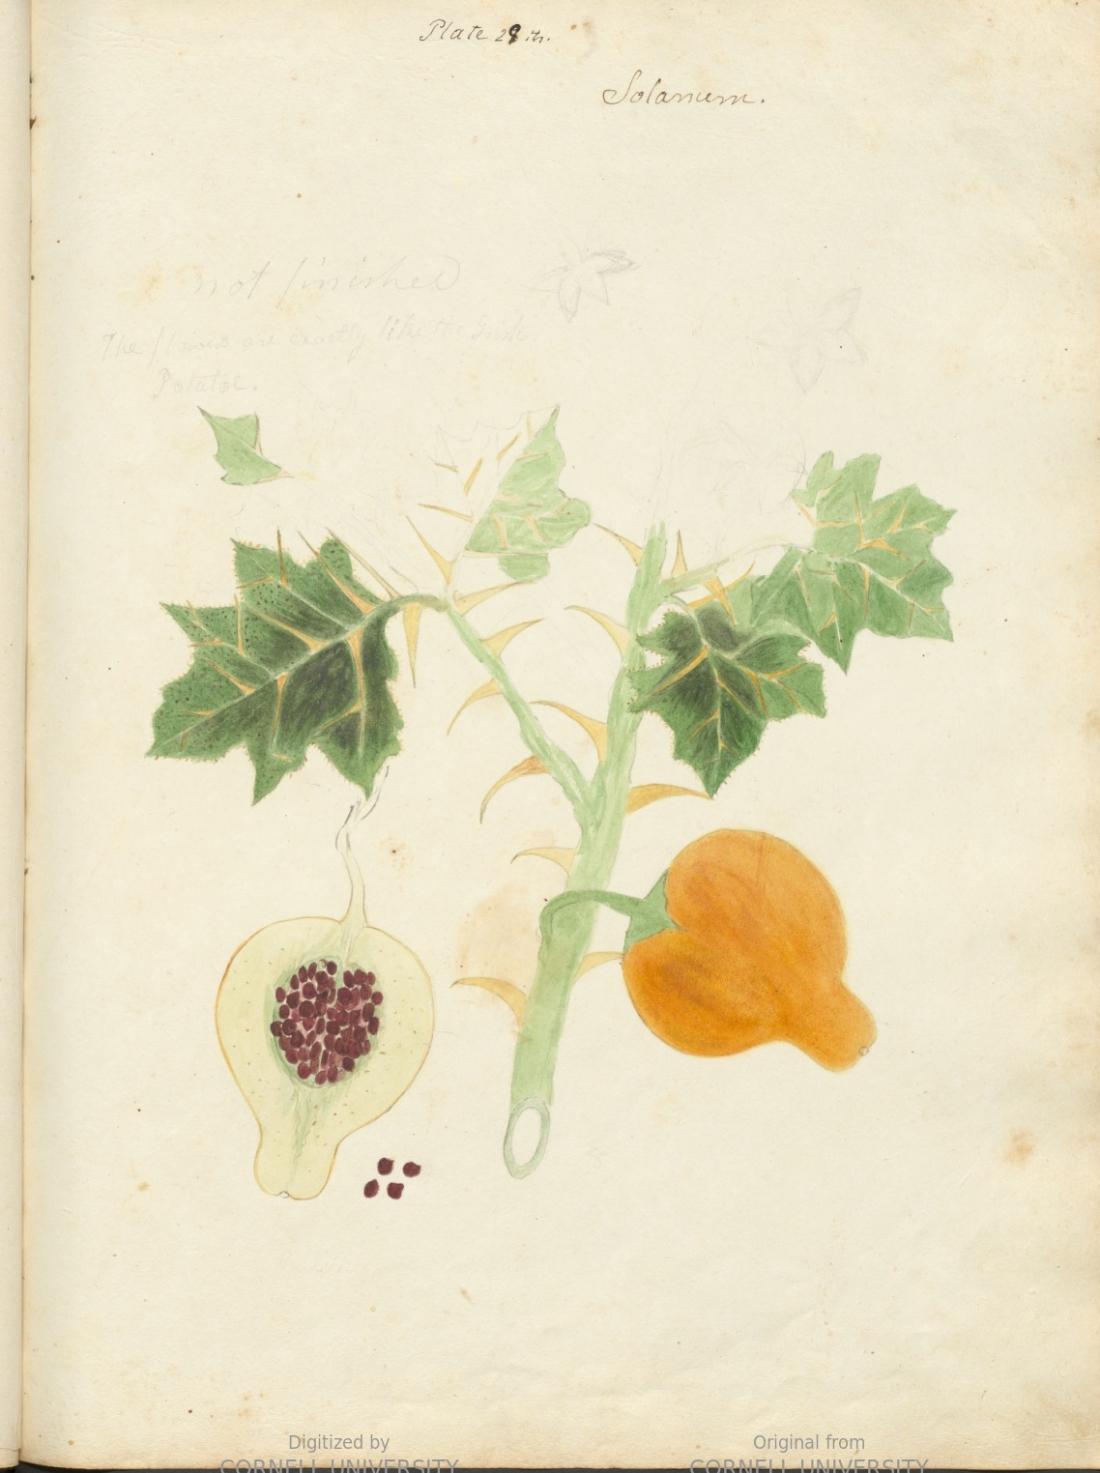 Solanum. Plate 29. Page 121.